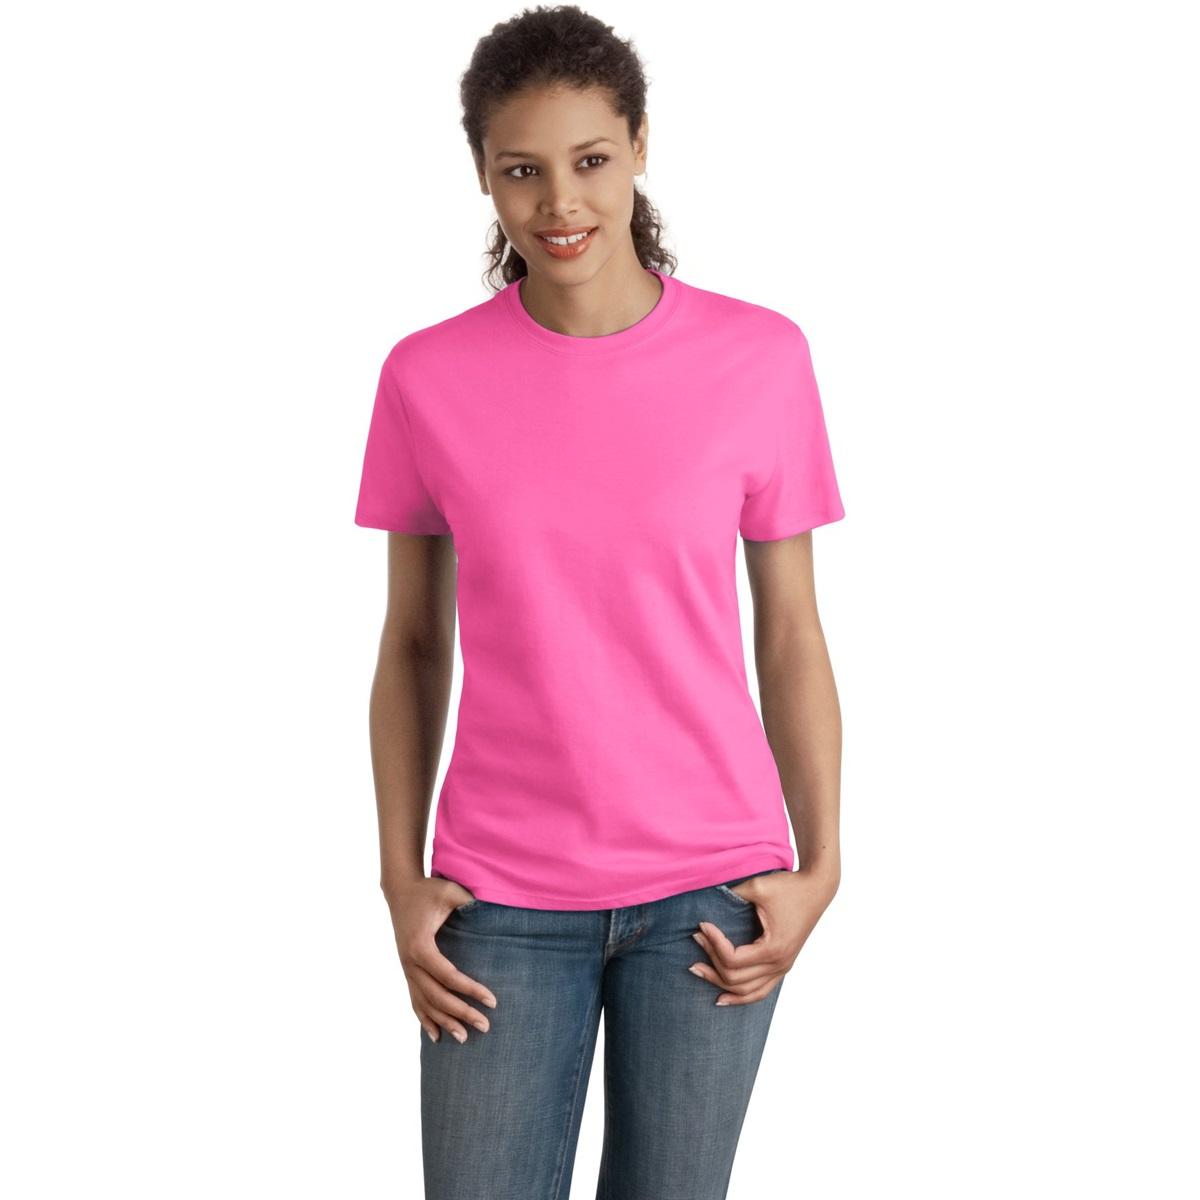 Hanes sl04 ladies nano t cotton t shirt pink for Pink ladies tee shirts